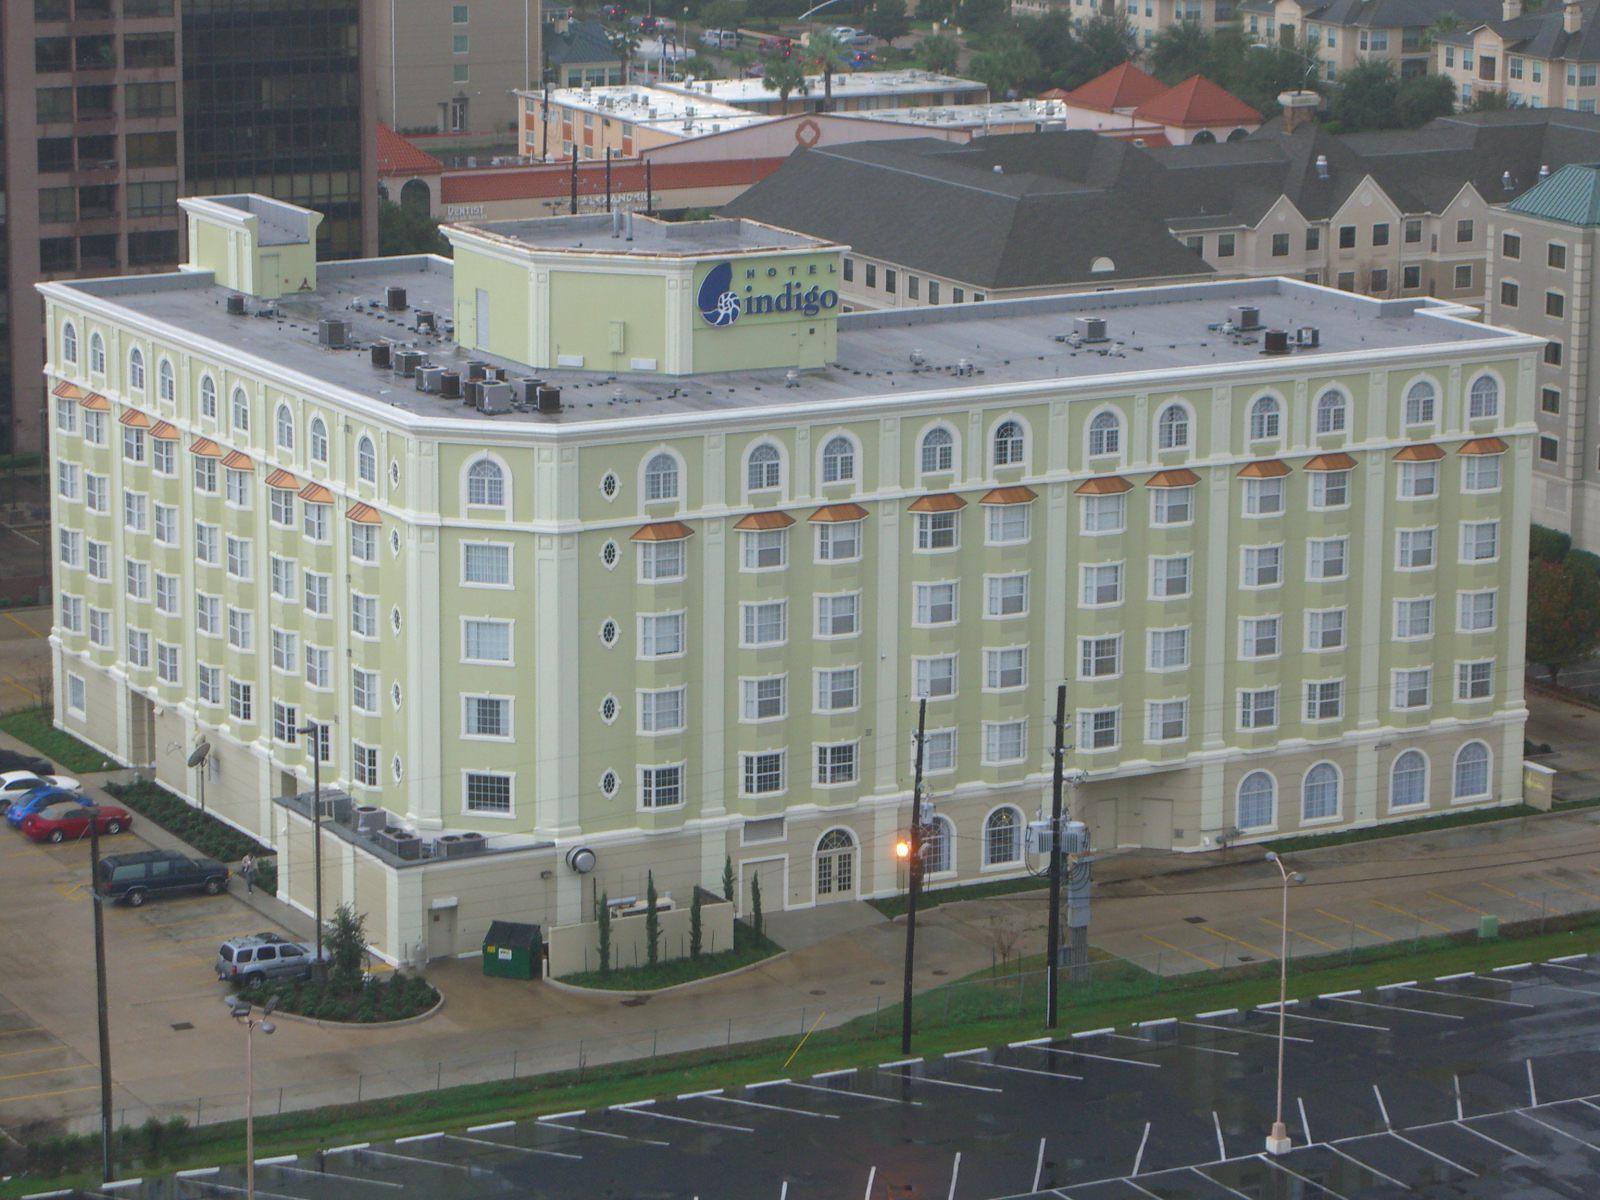 Hotel indigo wikipedia for Boutique hotels gold coast chicago